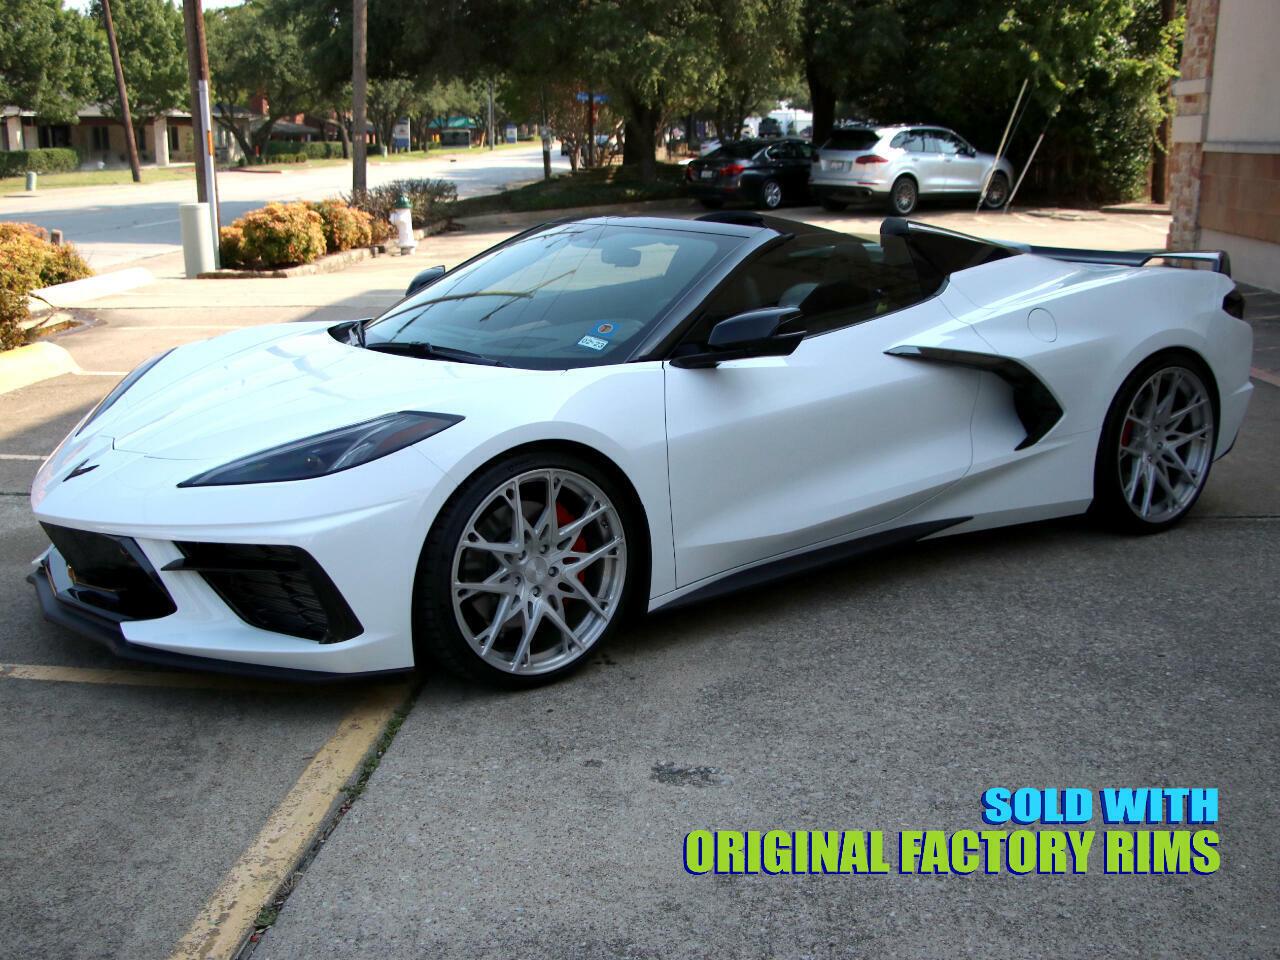 2021 White Chevrolet Corvette Convertible 3LT   C7 Corvette Photo 7